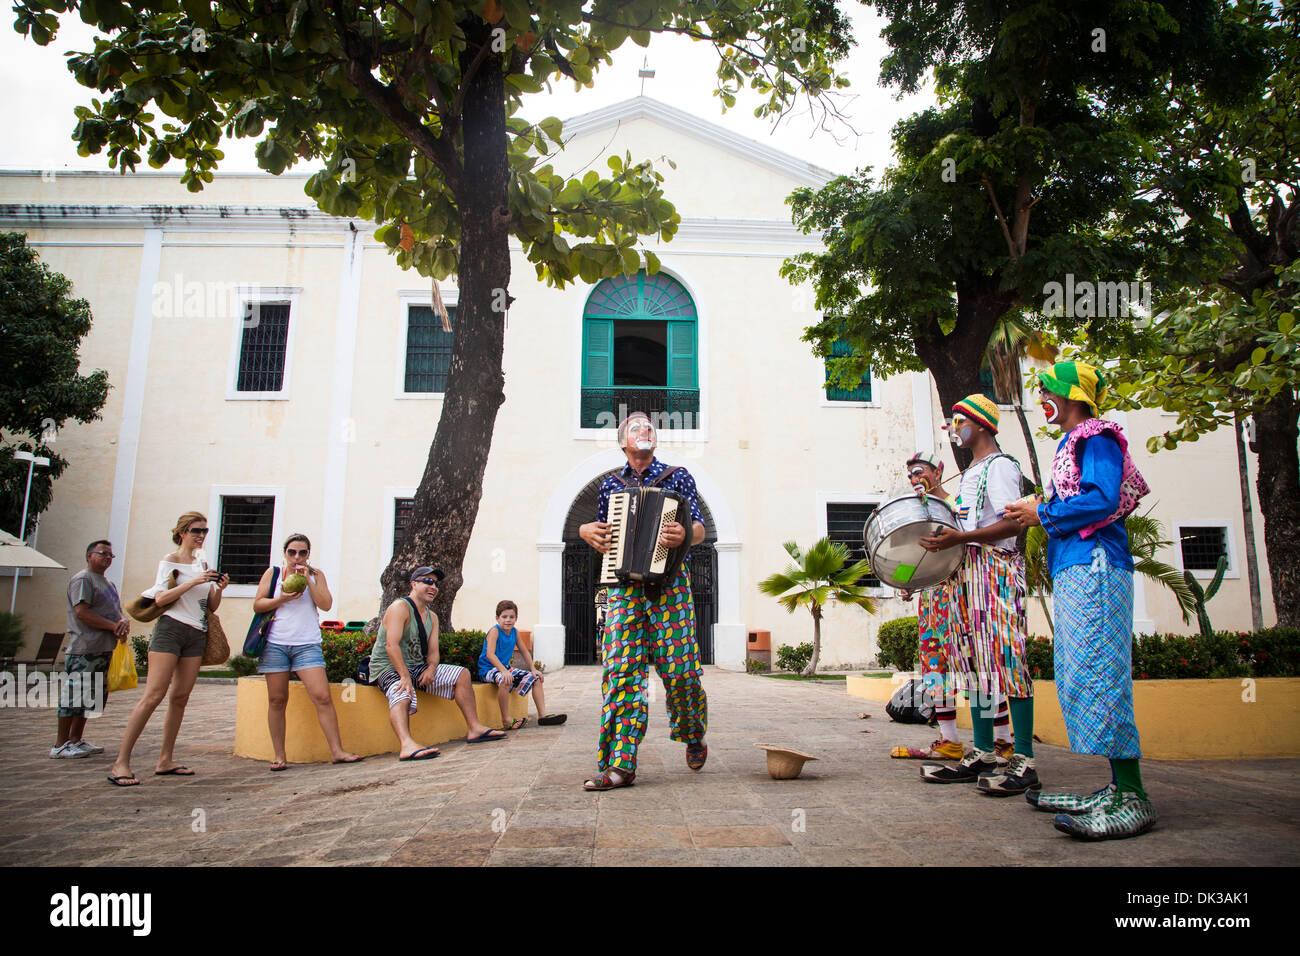 Scena dal Centro de Turismo do Ceará, Fortaleza, Brasile. Immagini Stock